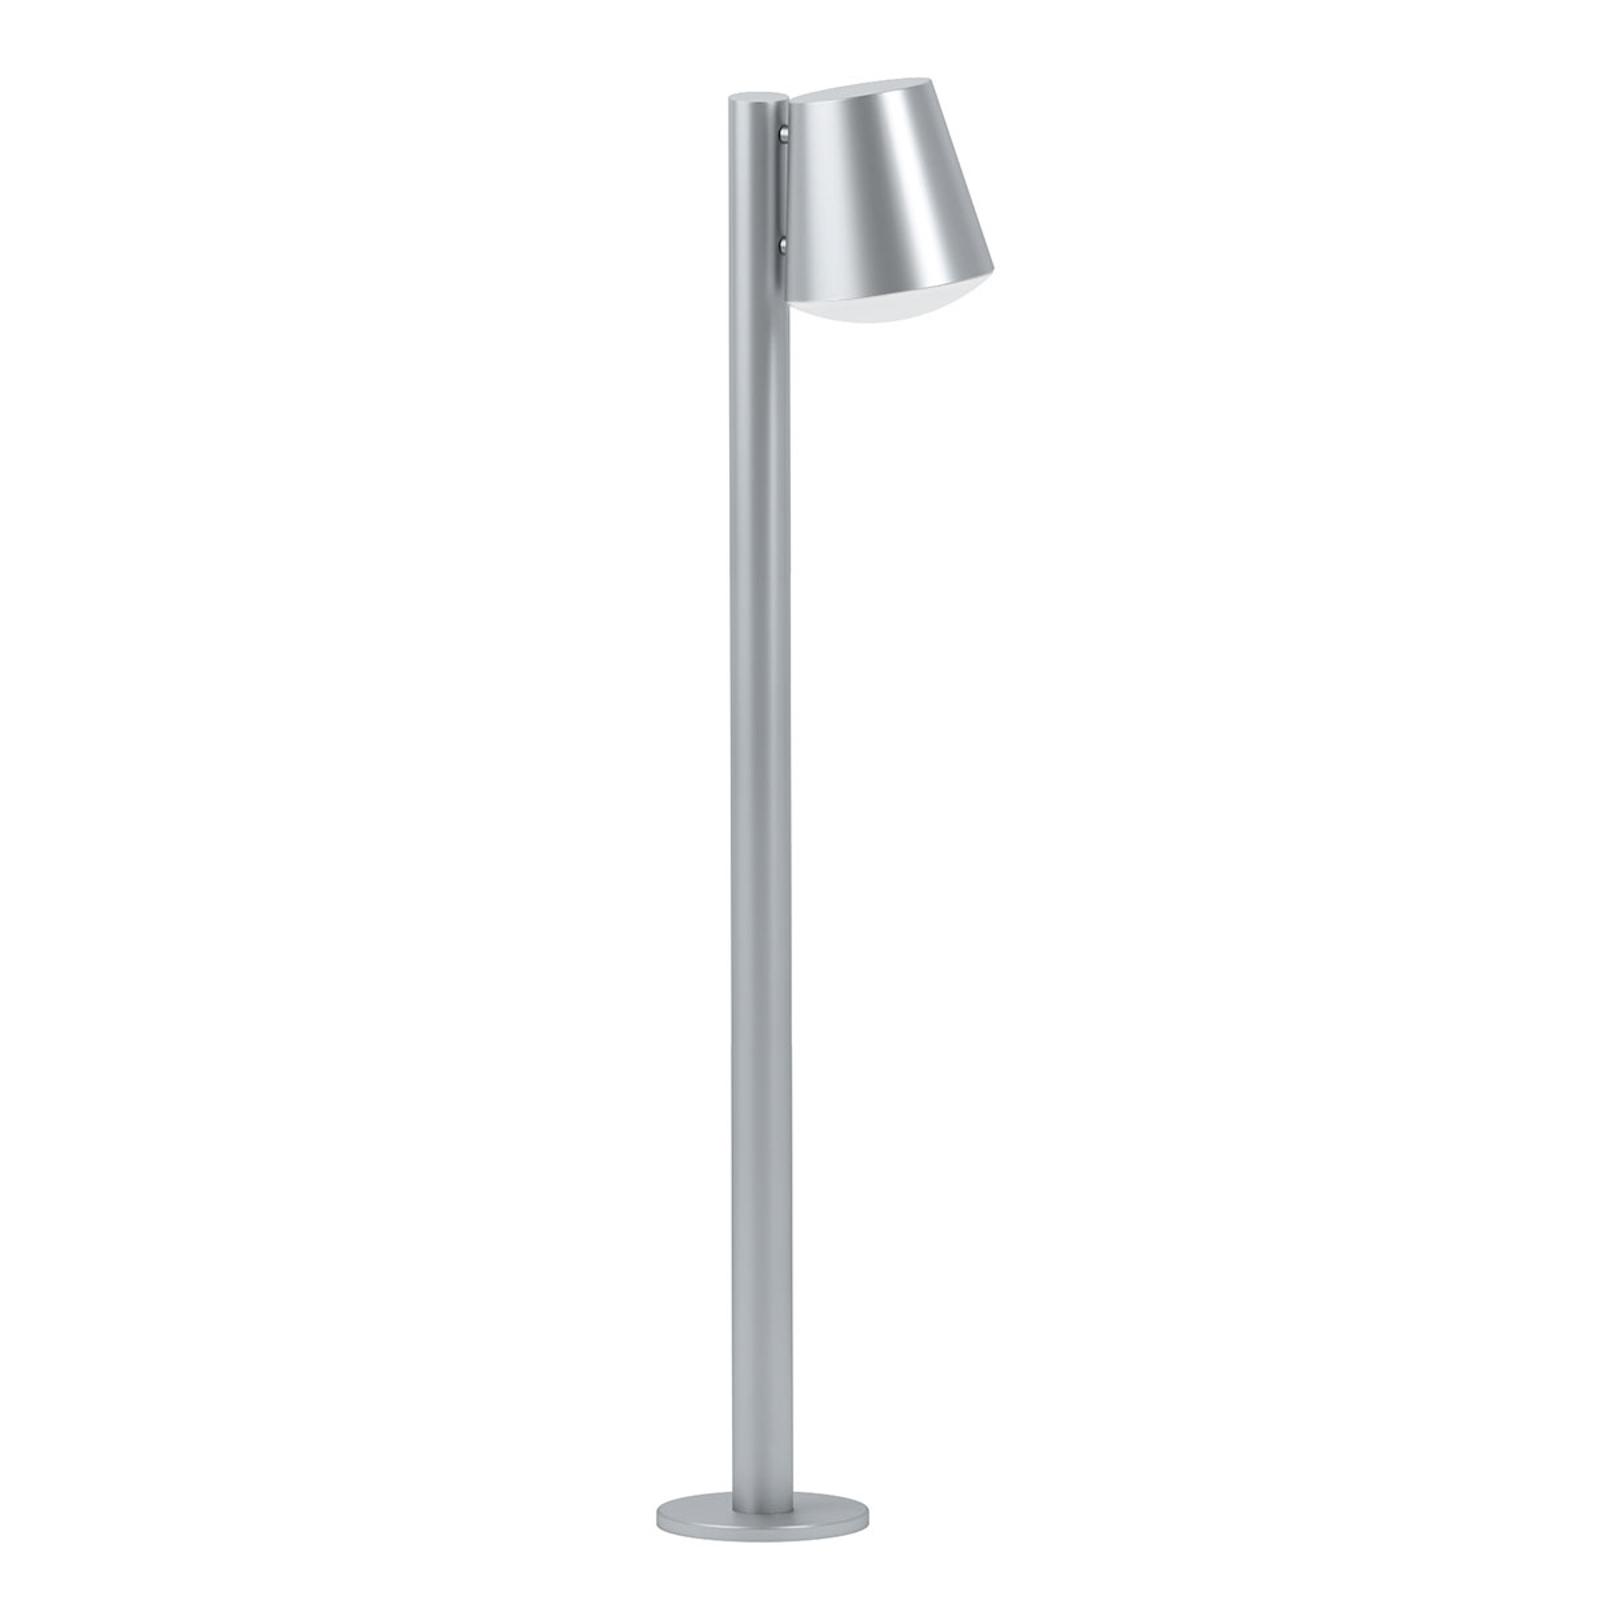 EGLO connect Caldiero-C LED-gadelampe stål